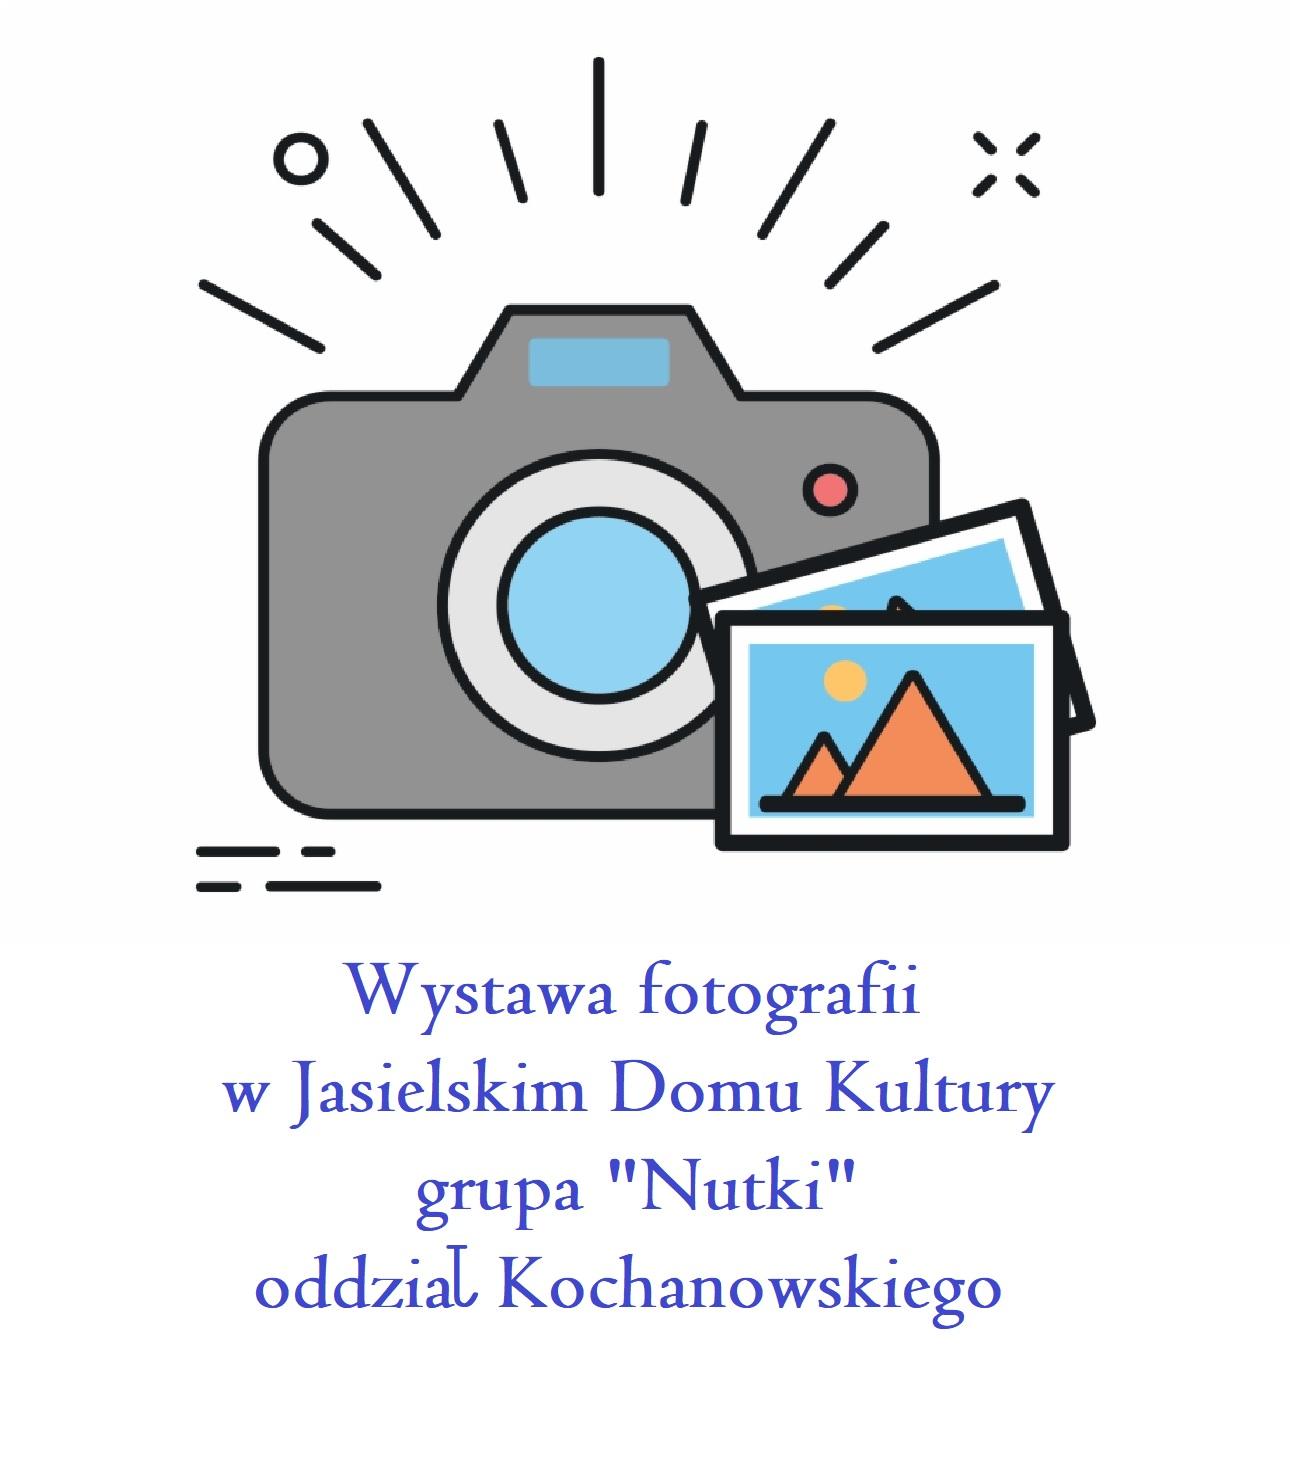 1. wystawa fotografii